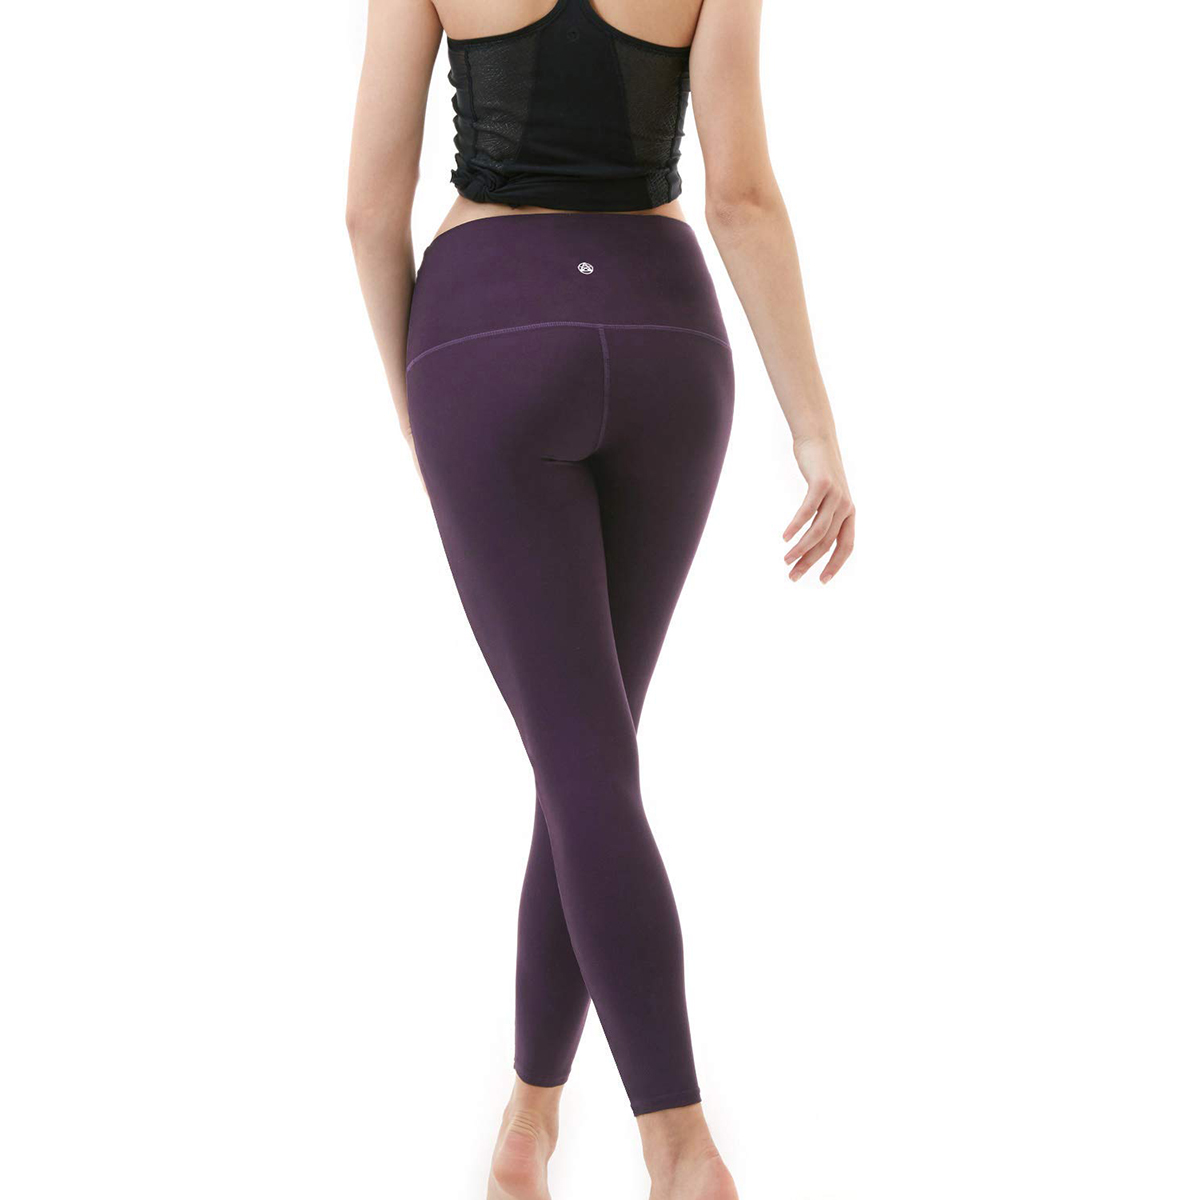 thumbnail 24 - TSLA Tesla FYP52 Women's High-Waisted Ultra-Stretch Tummy Control Yoga Pants